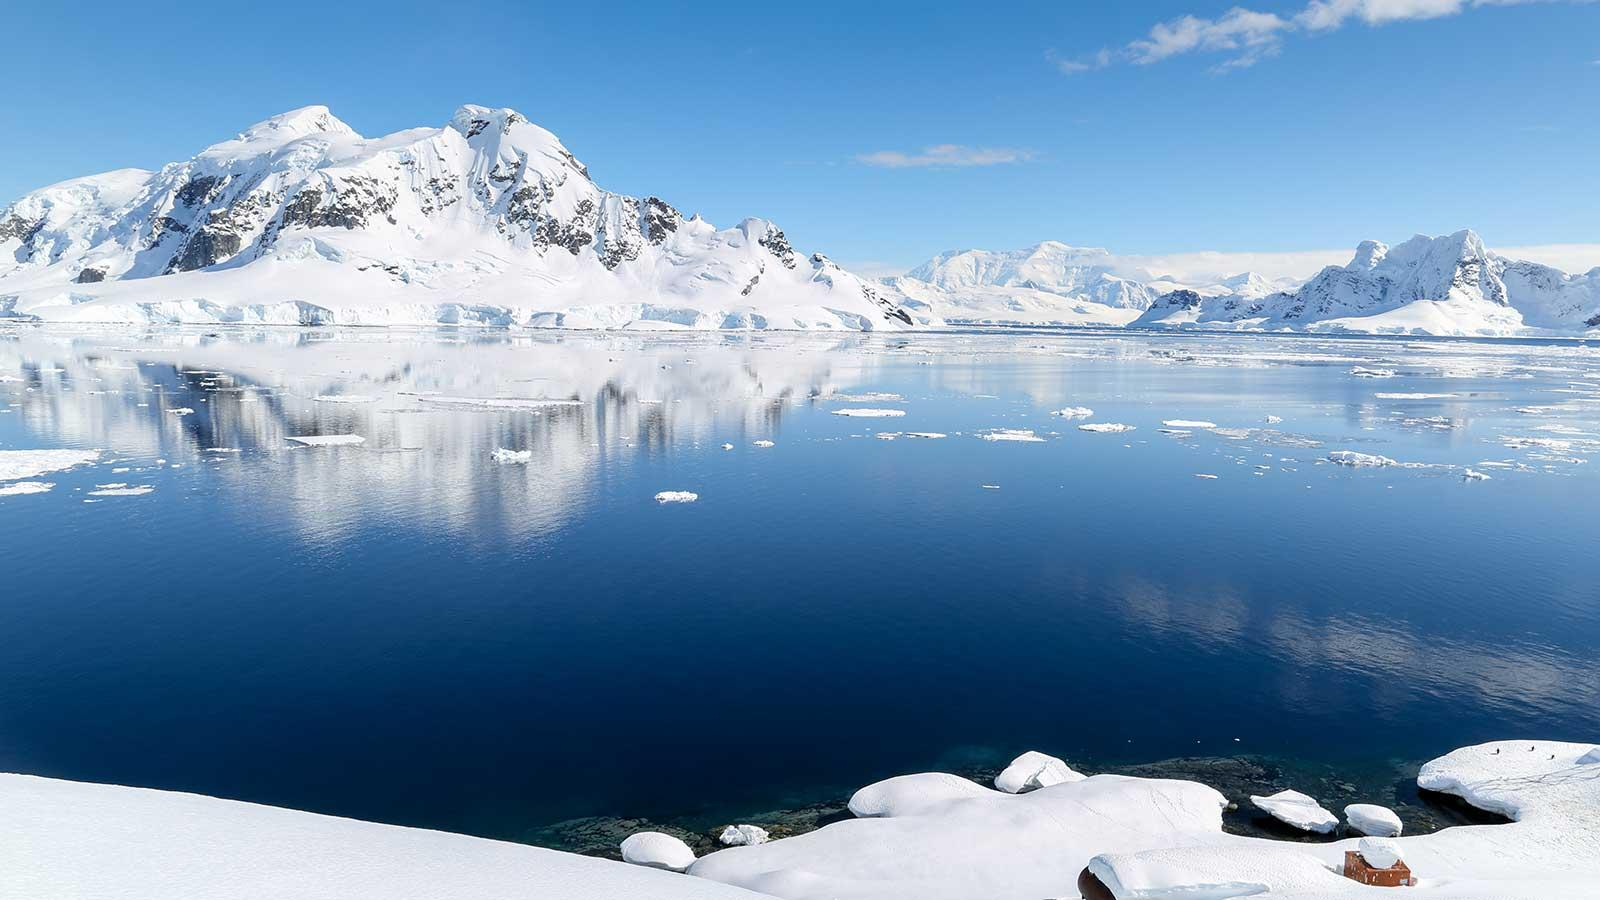 cookson-adventures-research-new-species-killer-whale-antarctica